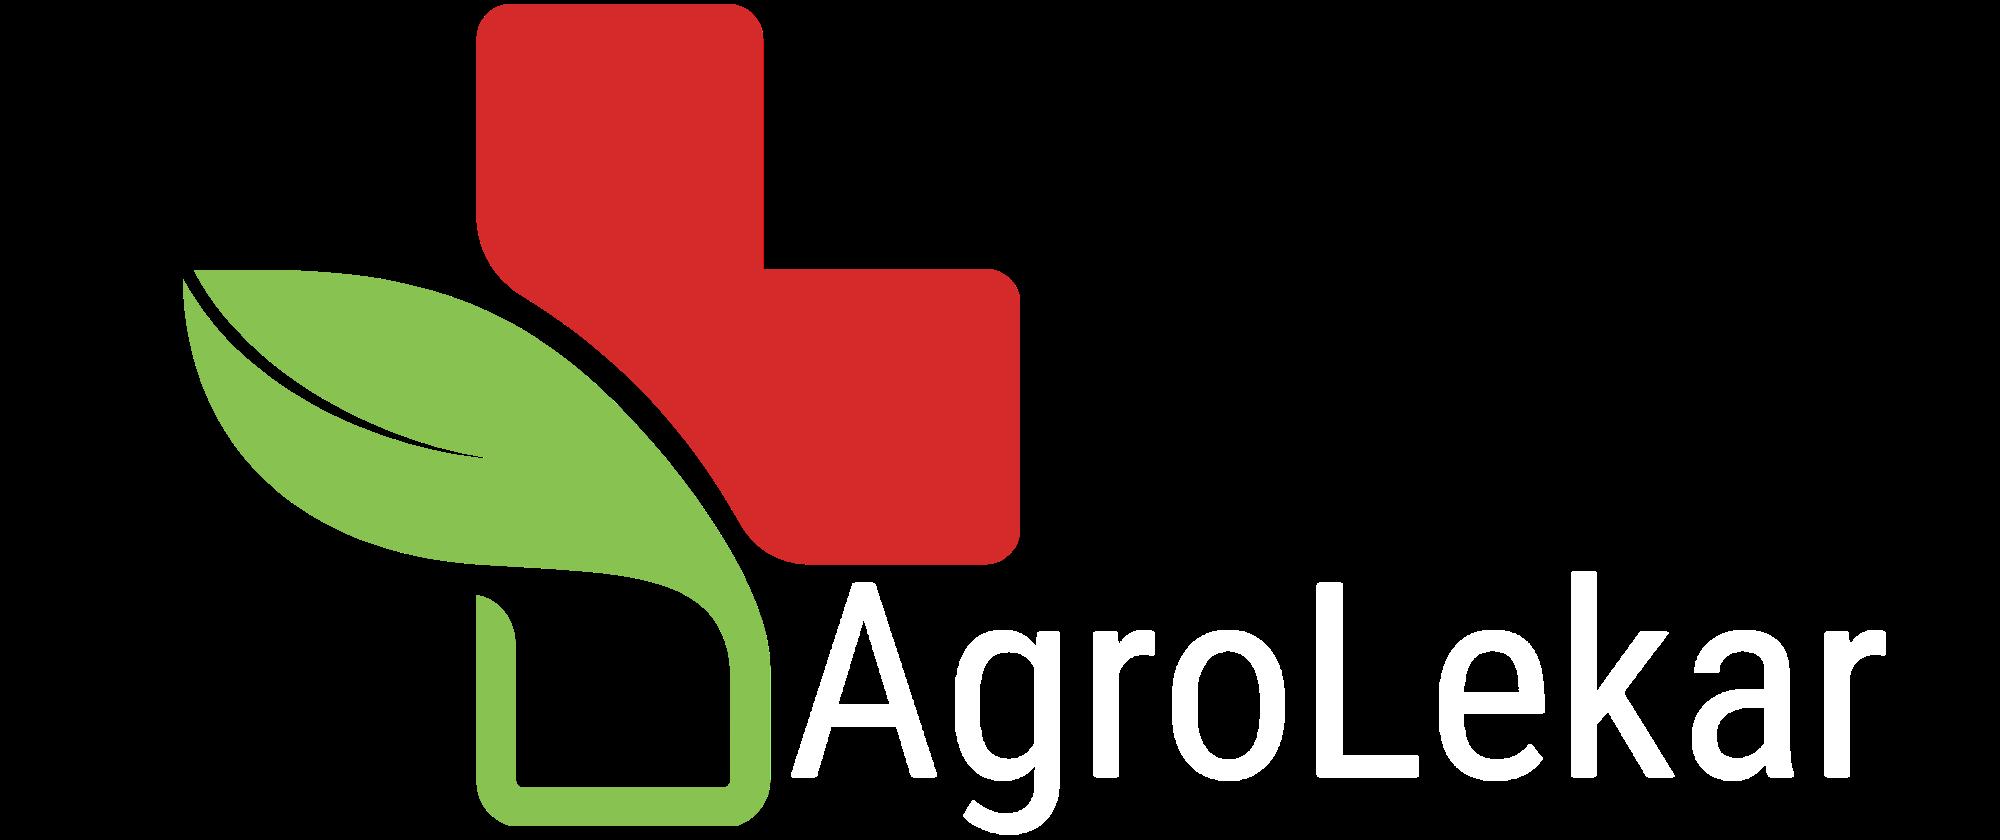 AgroLekar